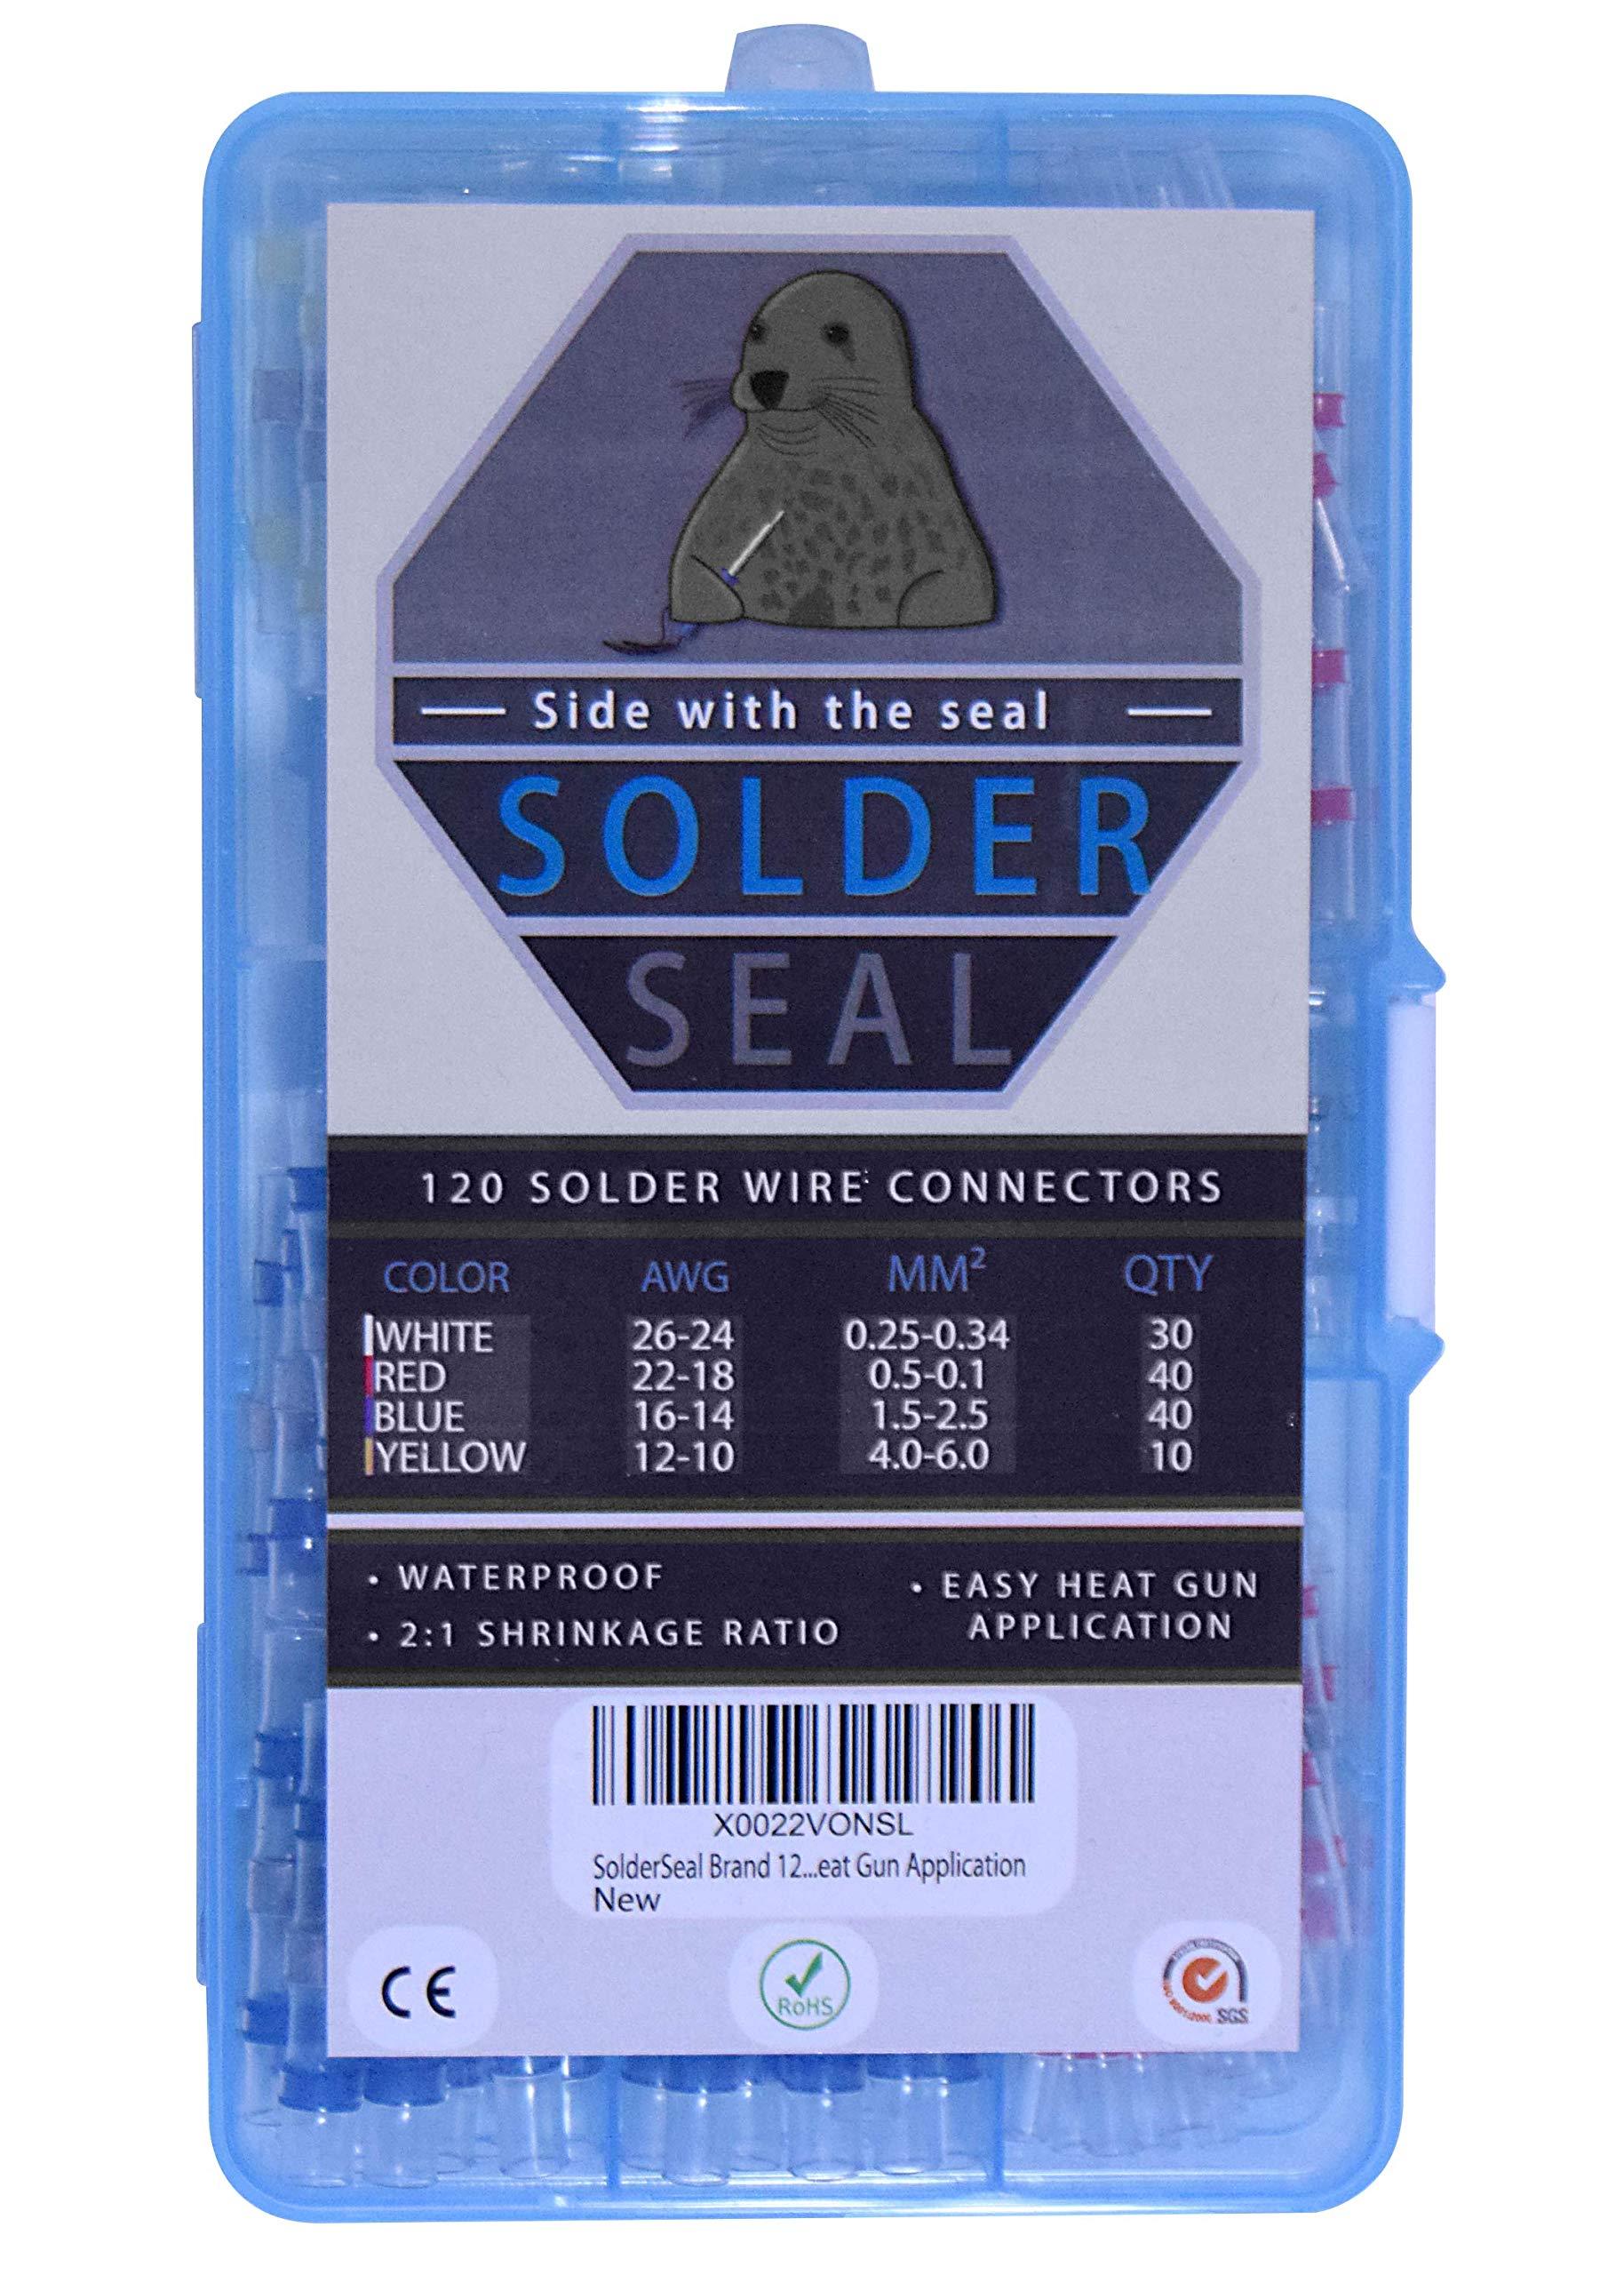 | SolderSeal Brand | 120PCS Premium Solder Seal Wire Connector Kit | Waterproof | Insulated | Marine | Automotive | No Crimp | Easy Heat Gun Application